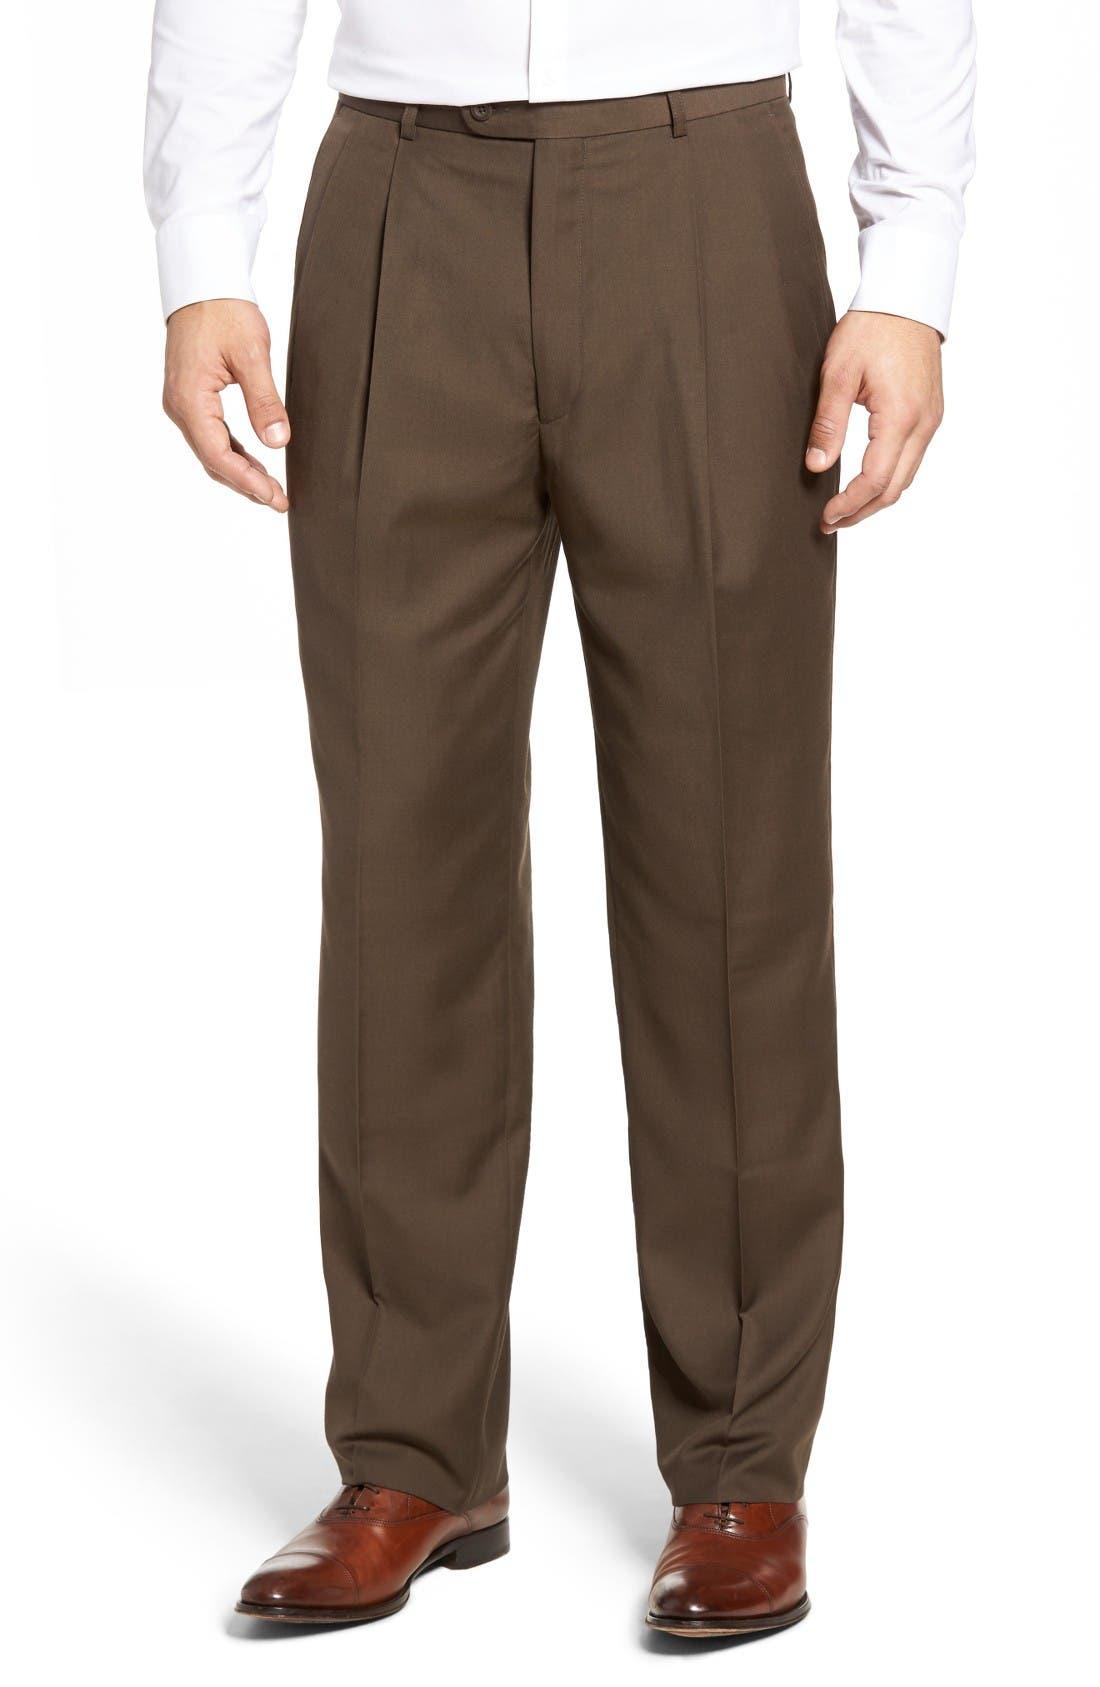 Alternate Image 1 Selected - Linea Naturale Pleated Microfiber Dress Pants